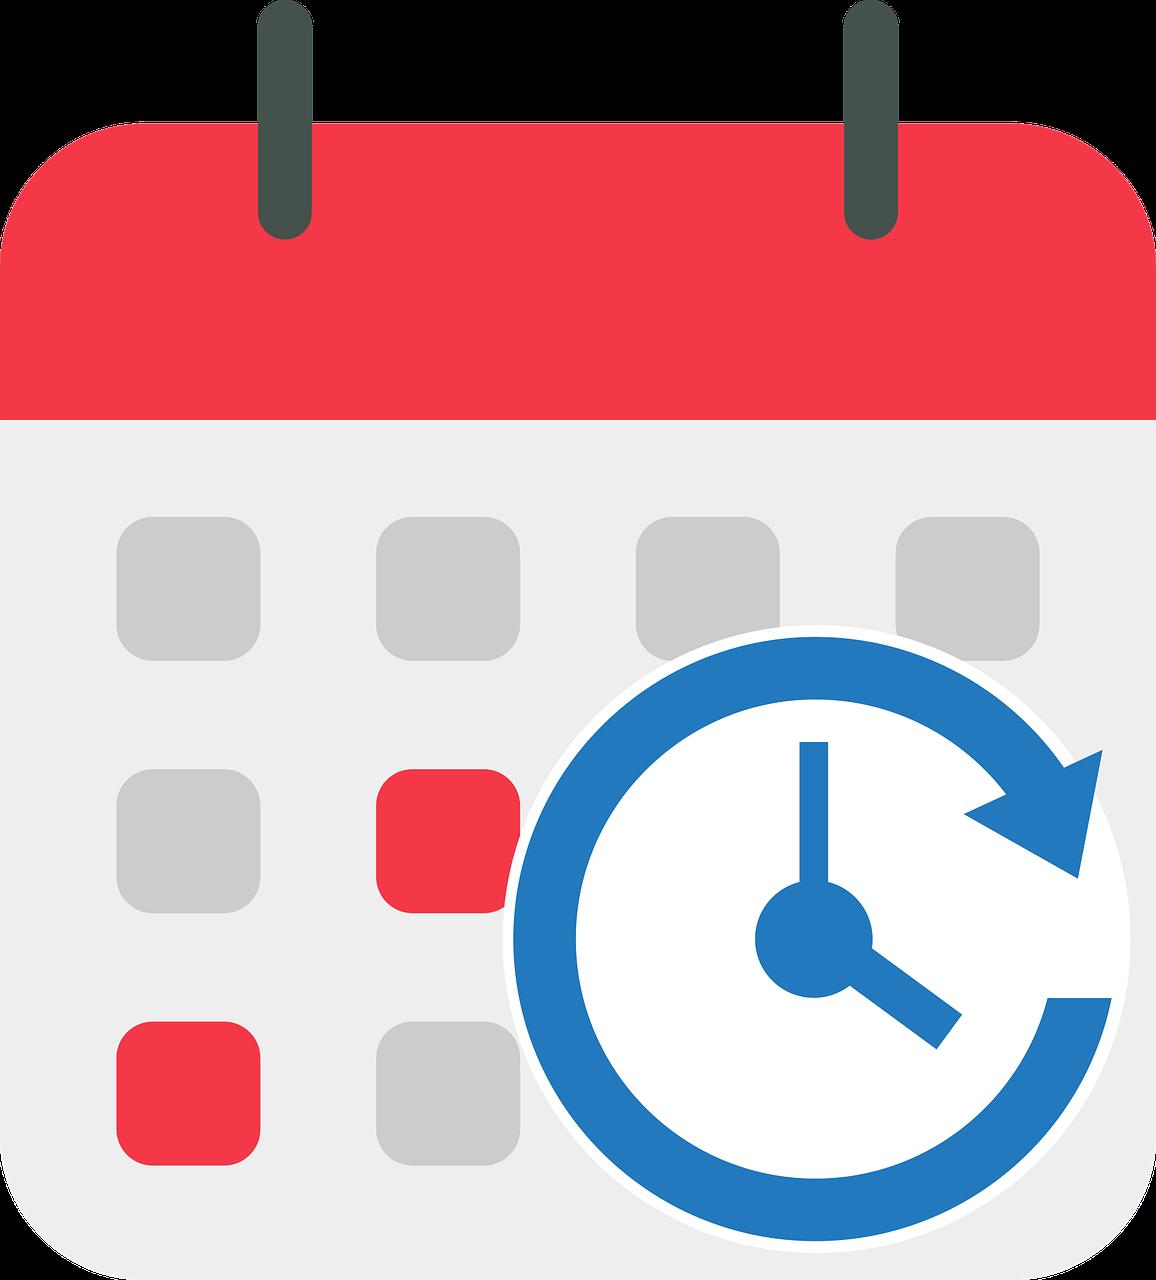 Calendar Schedule Monthly Calendar  - Dorigo / Pixabay